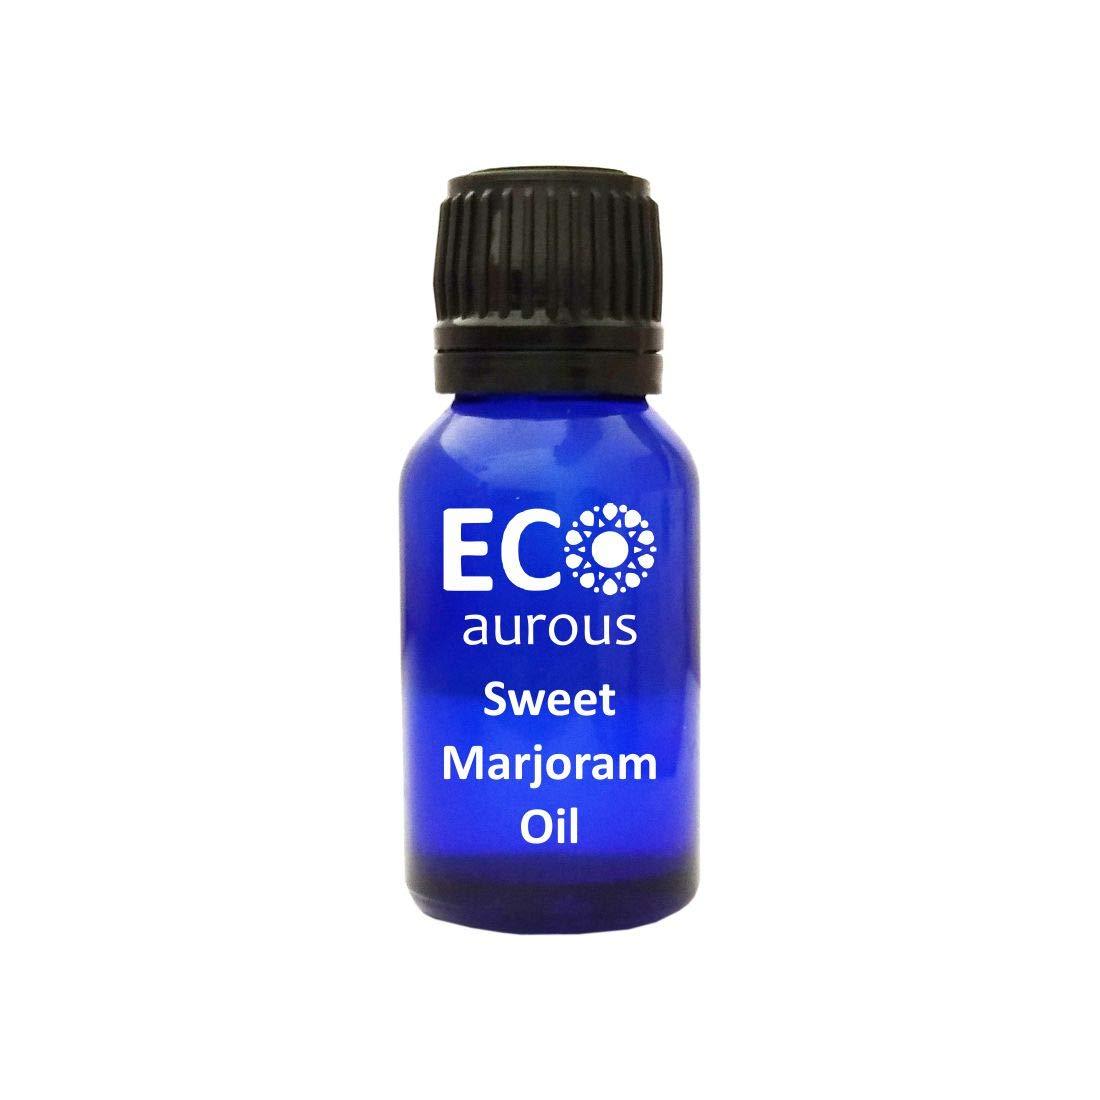 Eco Overseas parallel import regular item Aurous Sweet Lowest price challenge Marjoram Oil 100% Origanum Na Majorana Pure